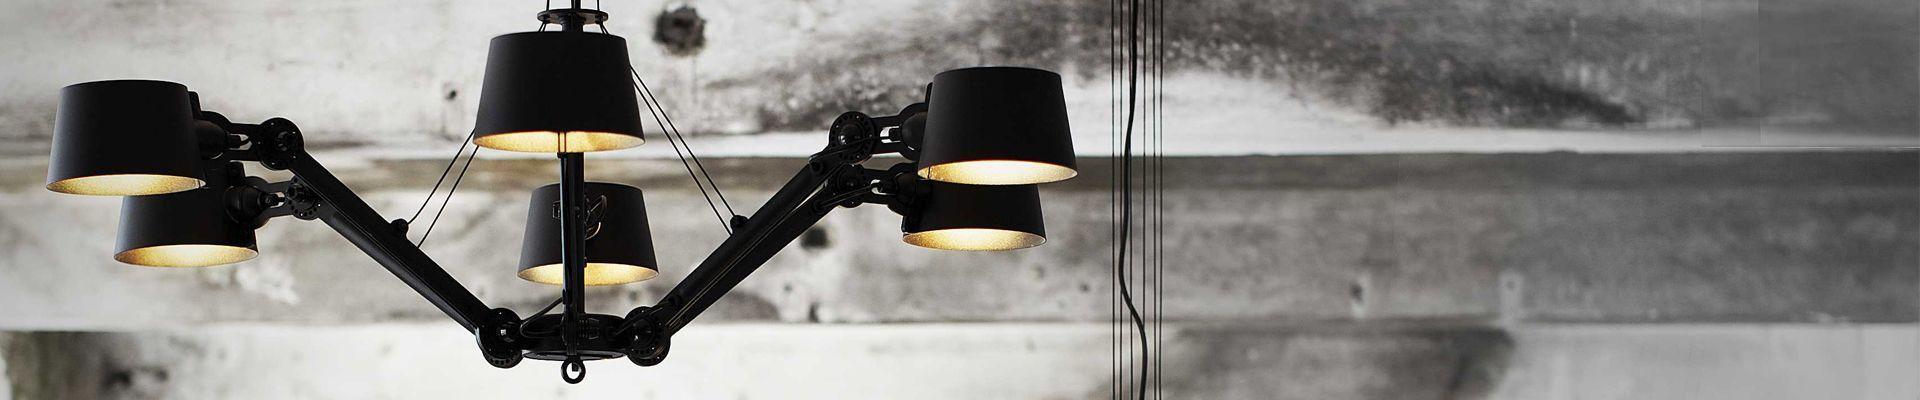 Tonone hanglampen